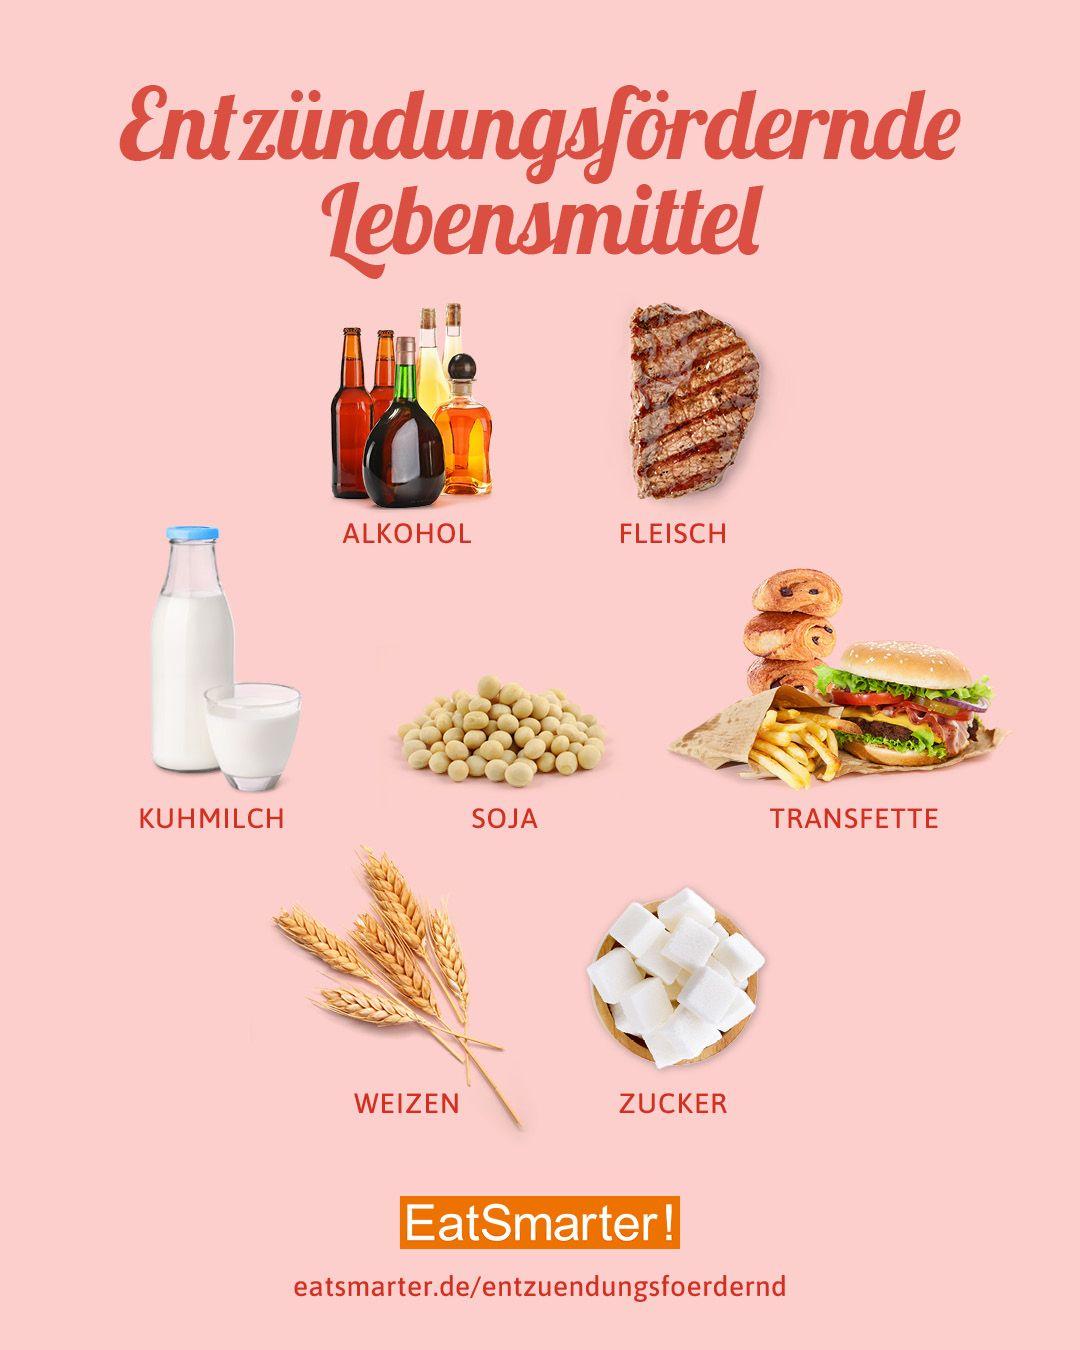 Diese 10 Lebensmittel verursachen Entzündungen!  Lebensmittel